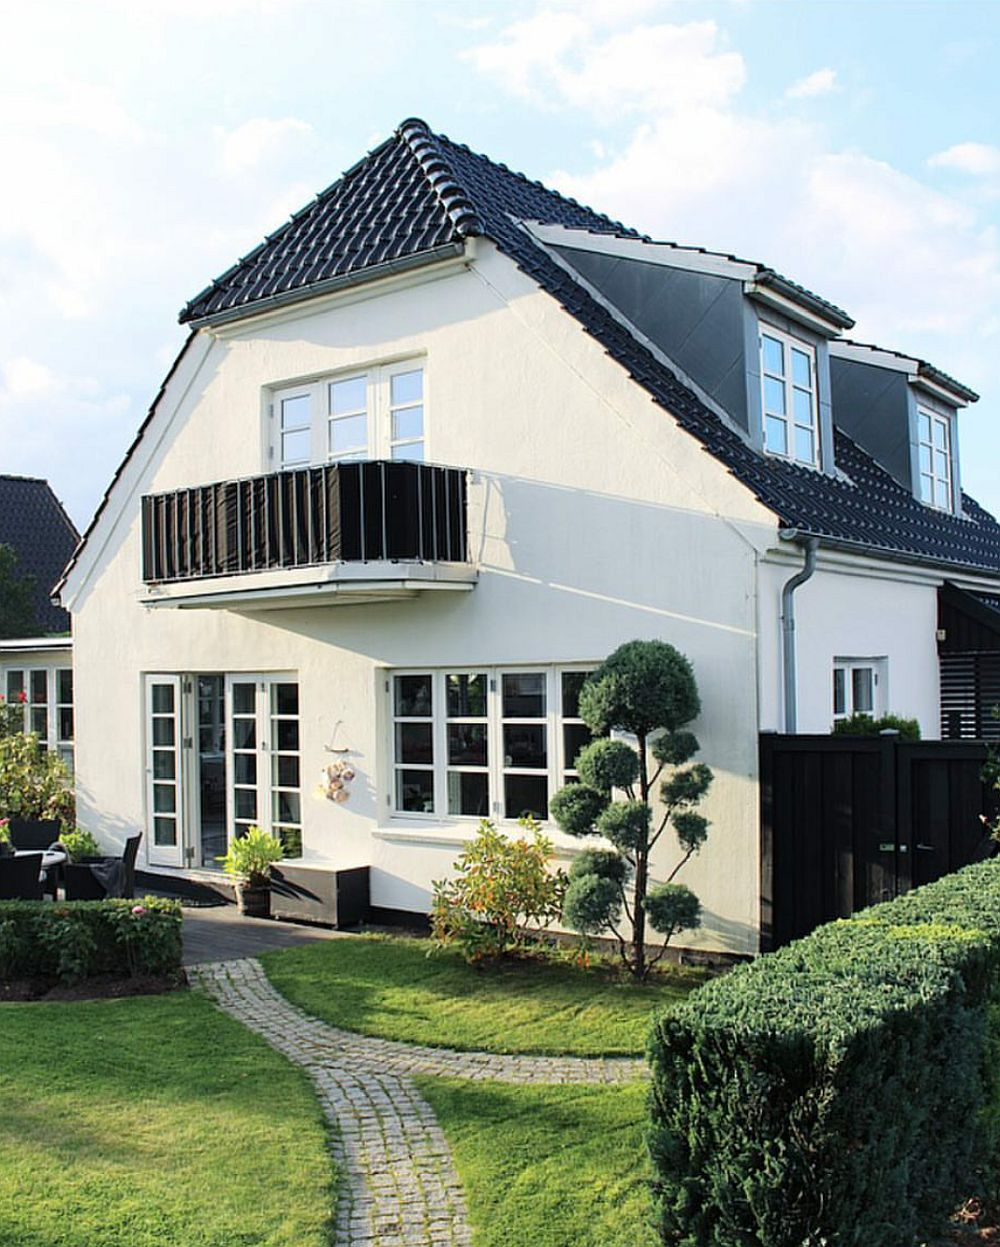 Casa danezei Kristen Skovbon, așa cum arată la exterior.